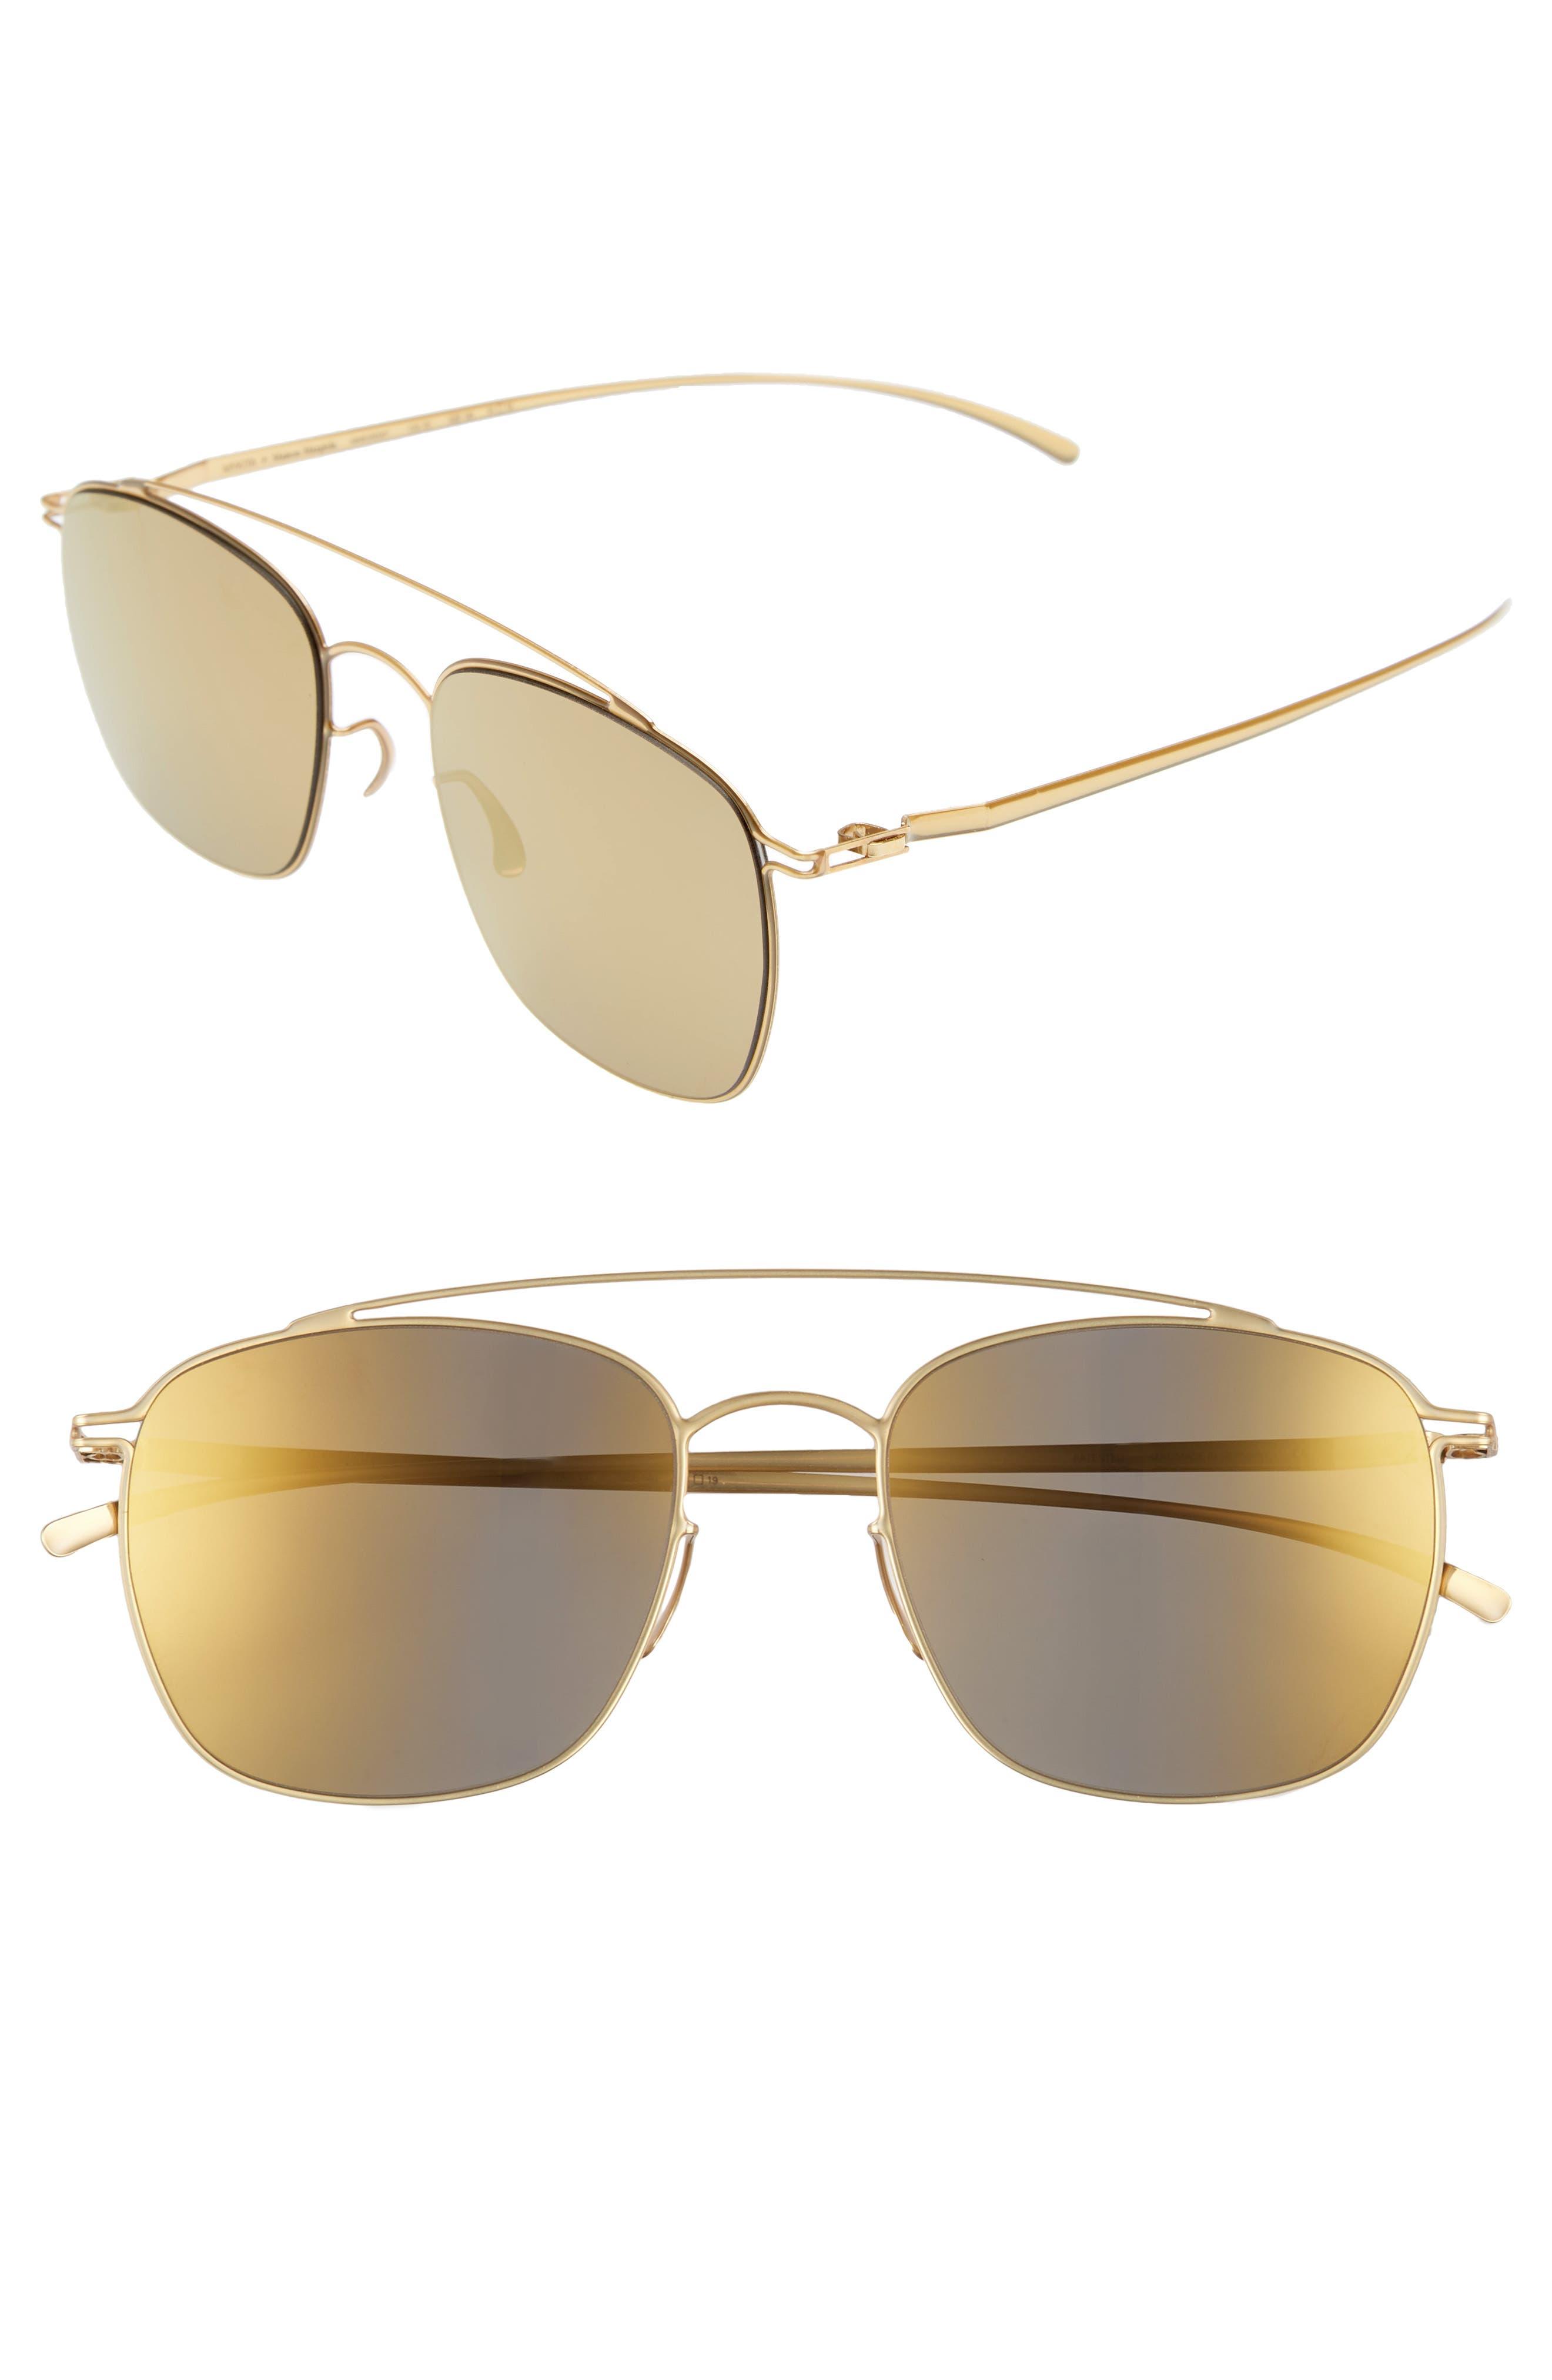 MMESSE007 51mm Aviator Sunglasses,                             Main thumbnail 3, color,